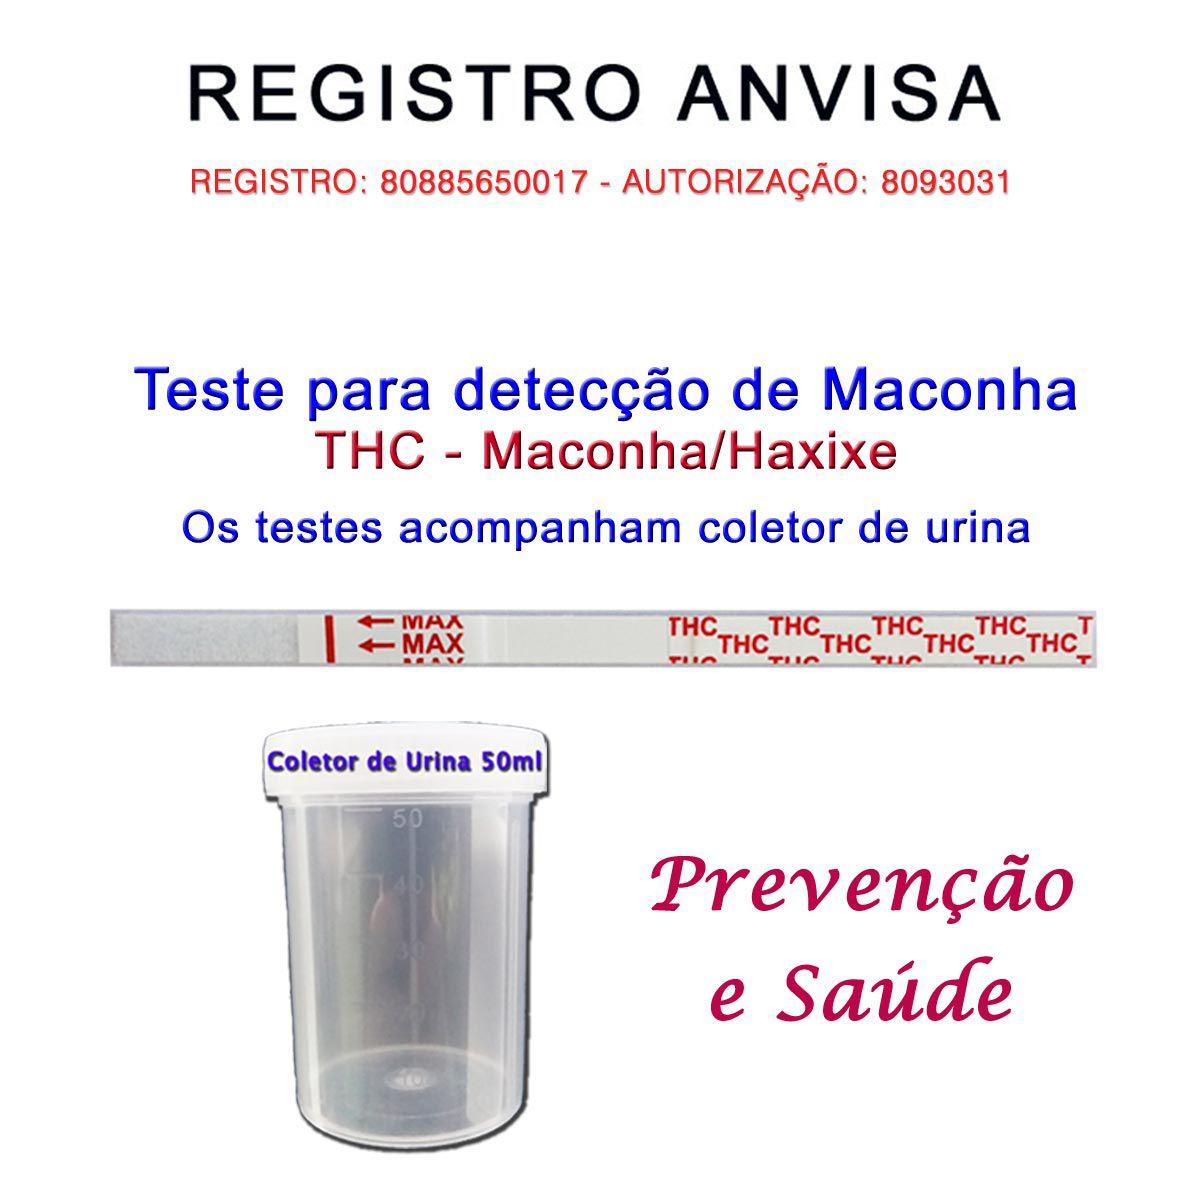 25 Kits para teste de THC com coletor de urina  - Testes Para Drogas e COVID-19. Máscaras e Como Parar de Beber e Fumar